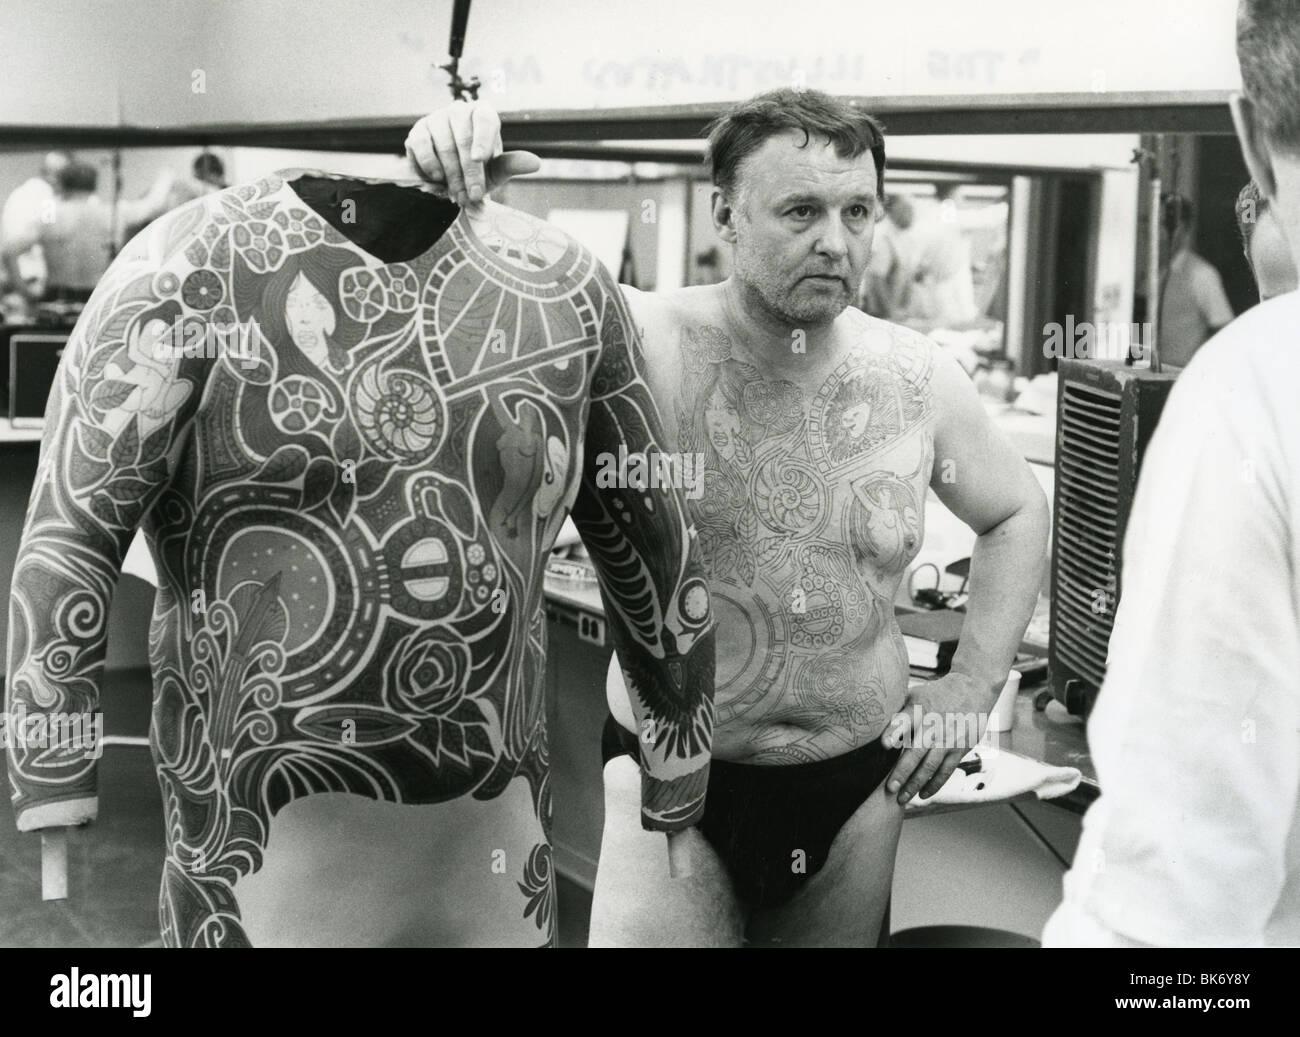 Rod Steiger Tattoos